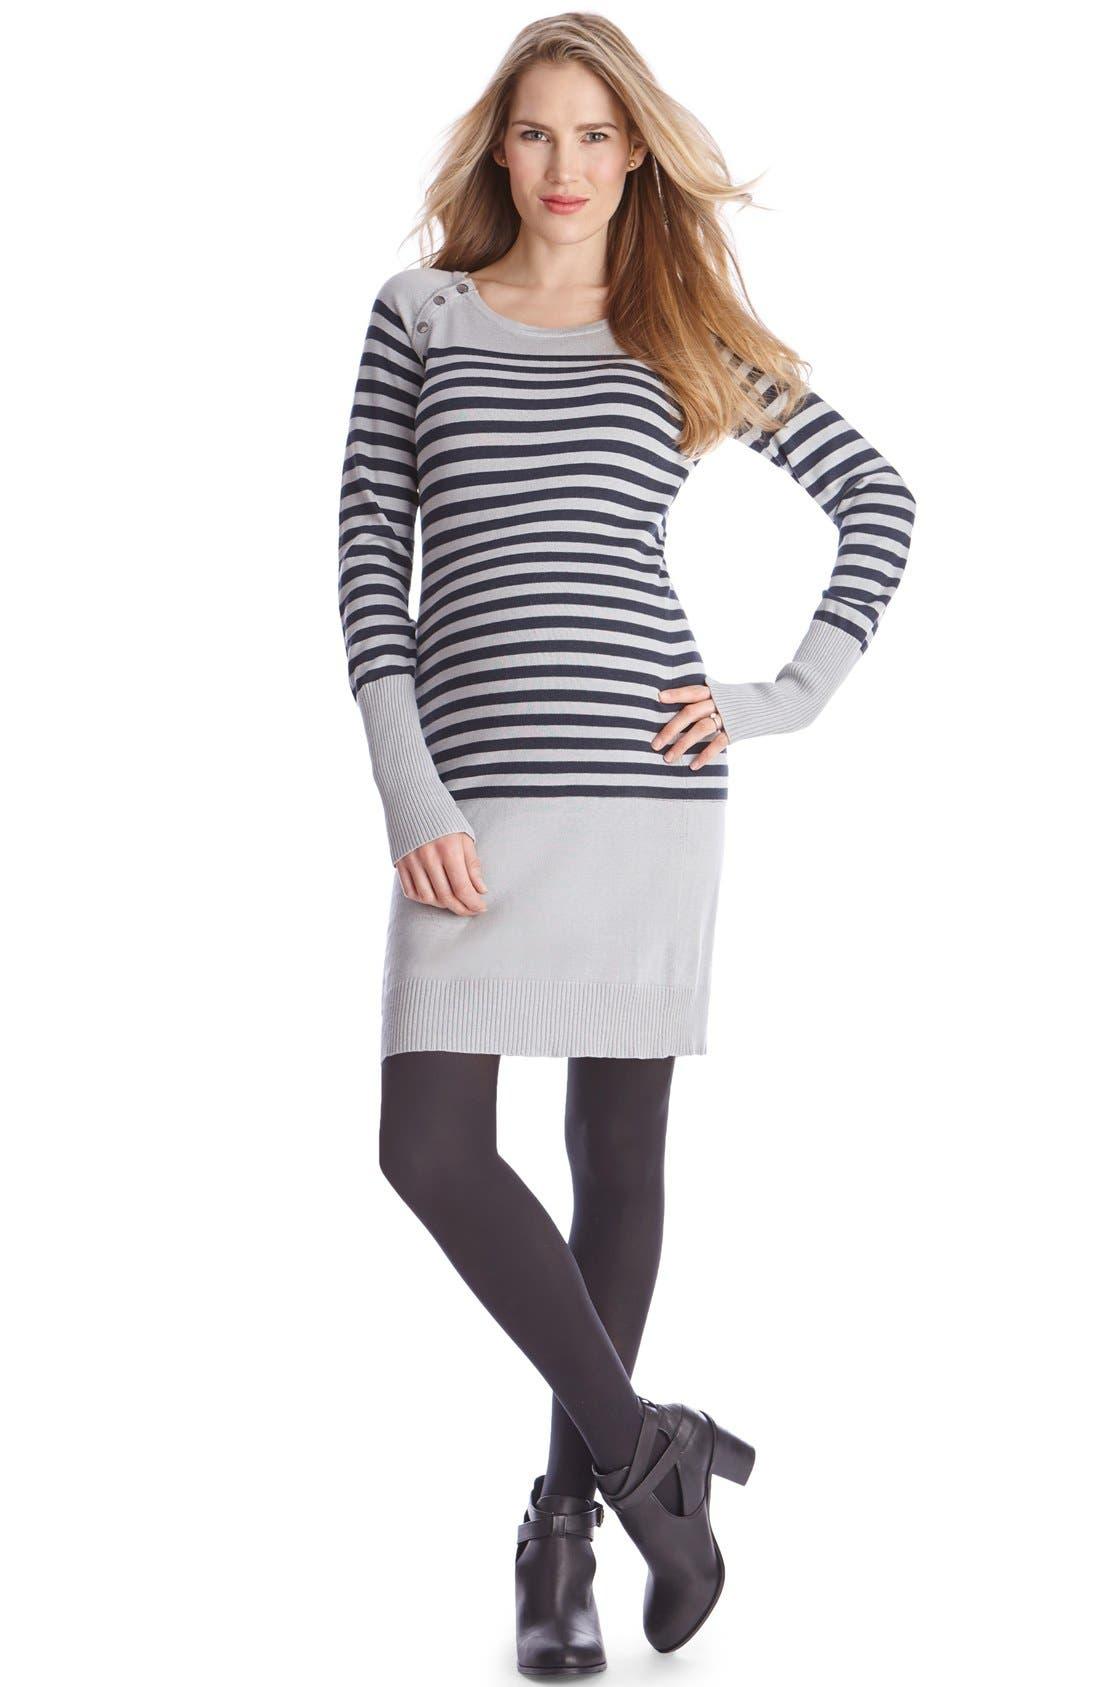 Alternate Image 1 Selected - Seraphine'Rozalia' Stripe Maternity/Nursing Sweater Dress